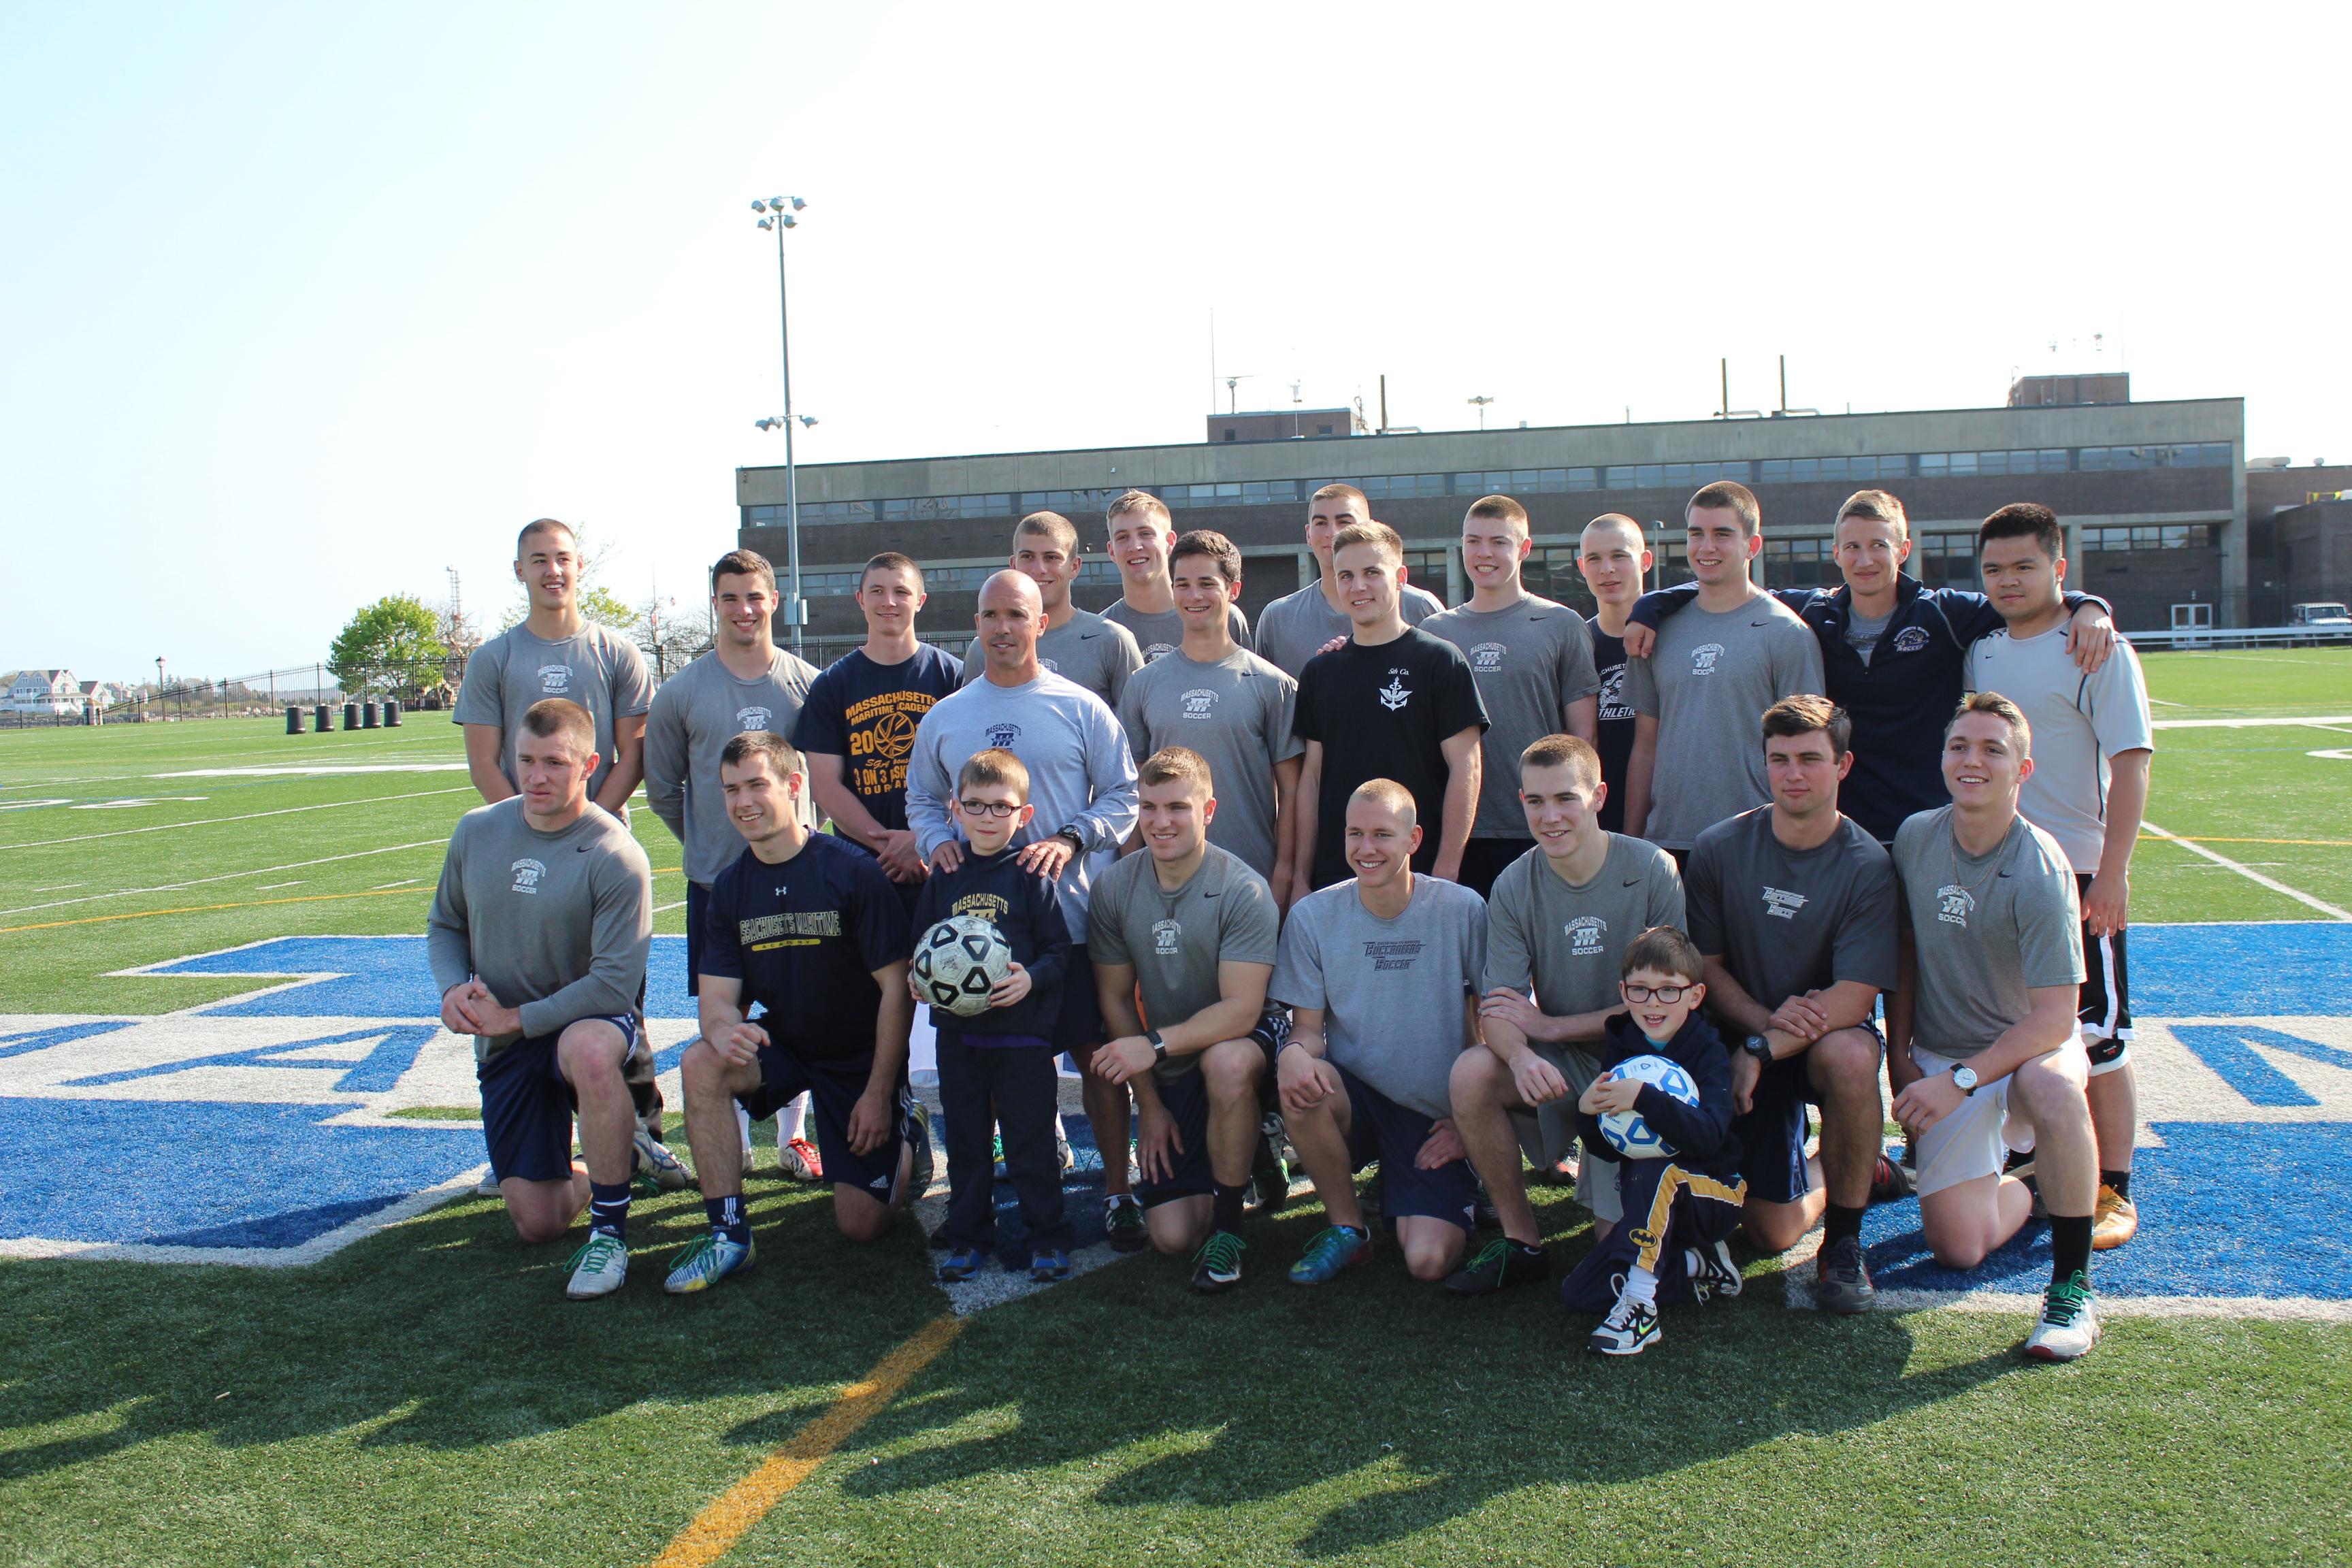 Mass. Maritime Soccer Team to Support Marshfield Boy